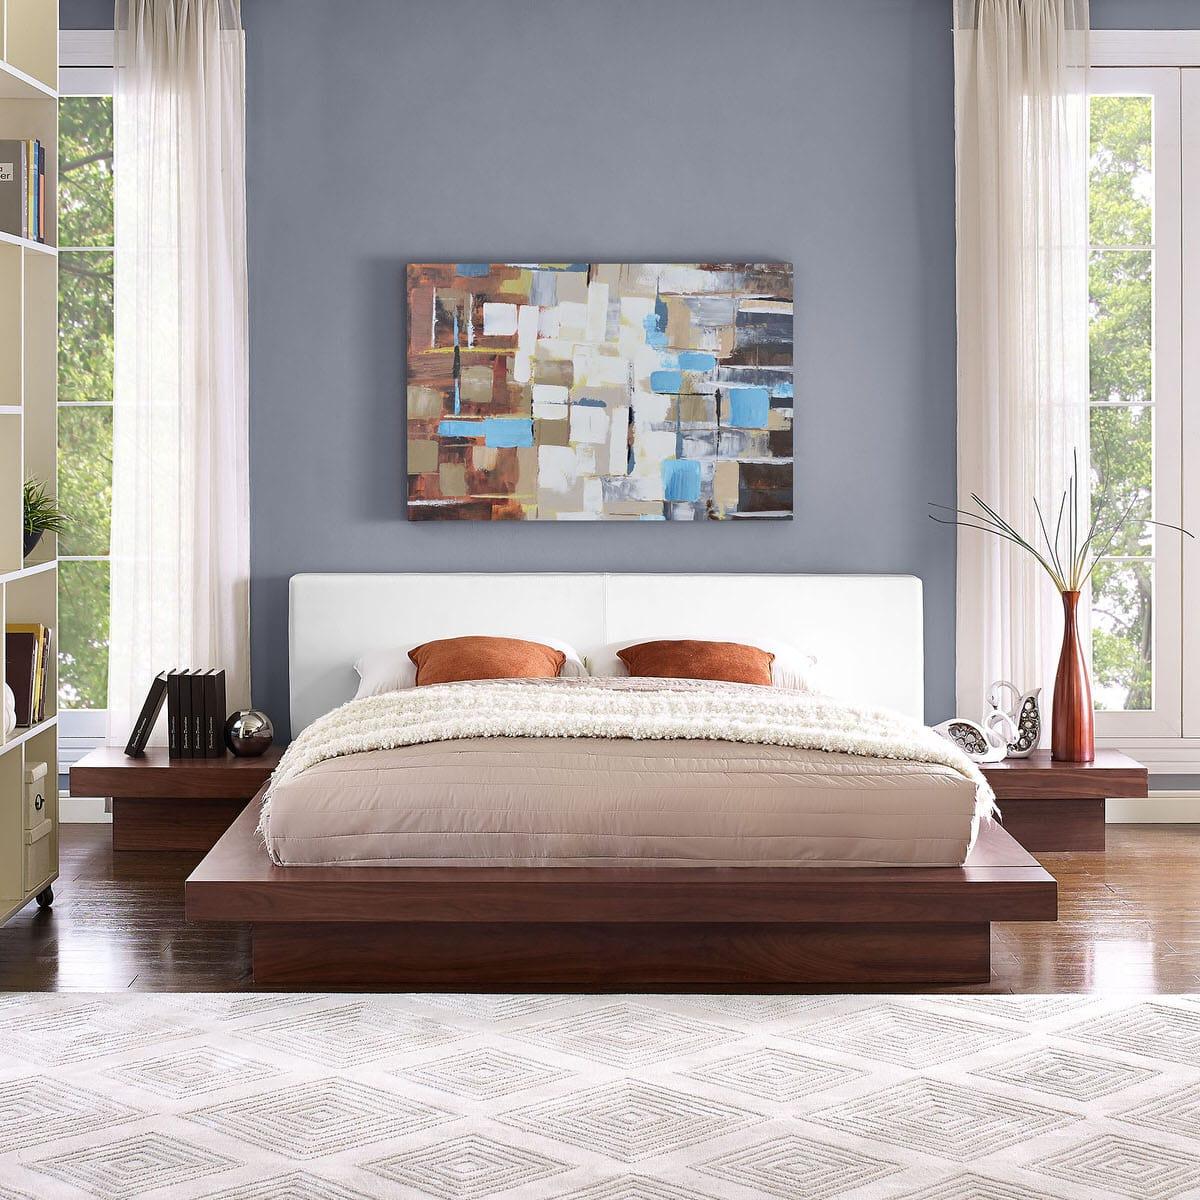 walnut bedroom set.  Freja 3 Piece Queen Vinyl Bedroom Set Walnut White by Modway